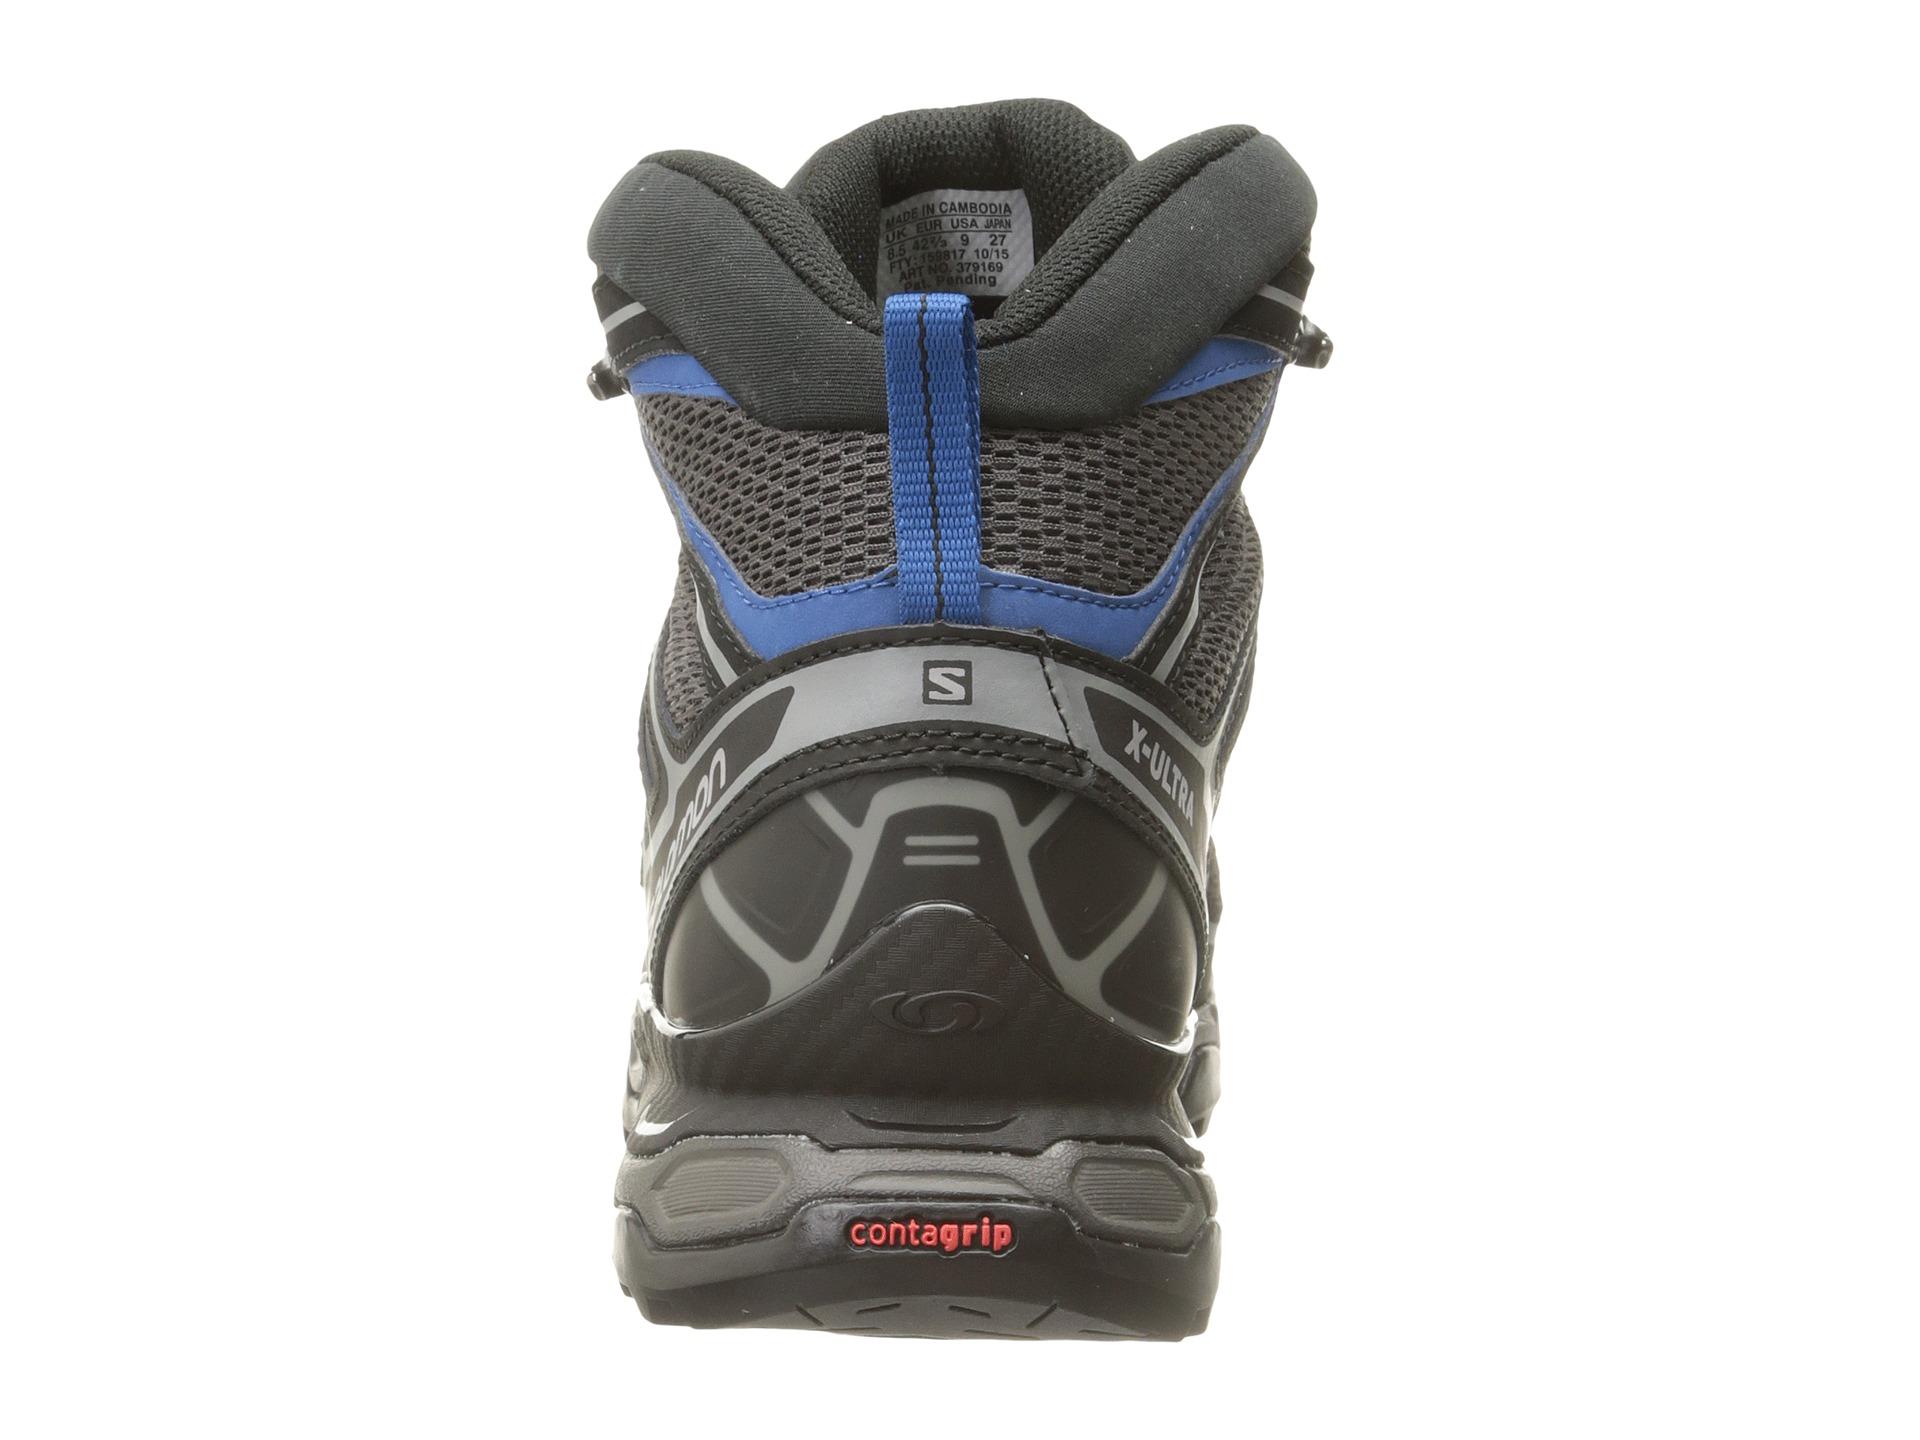 Salomon x ultra mid aero w botas de senderismo mujer - titanium/swamp/opaline blue